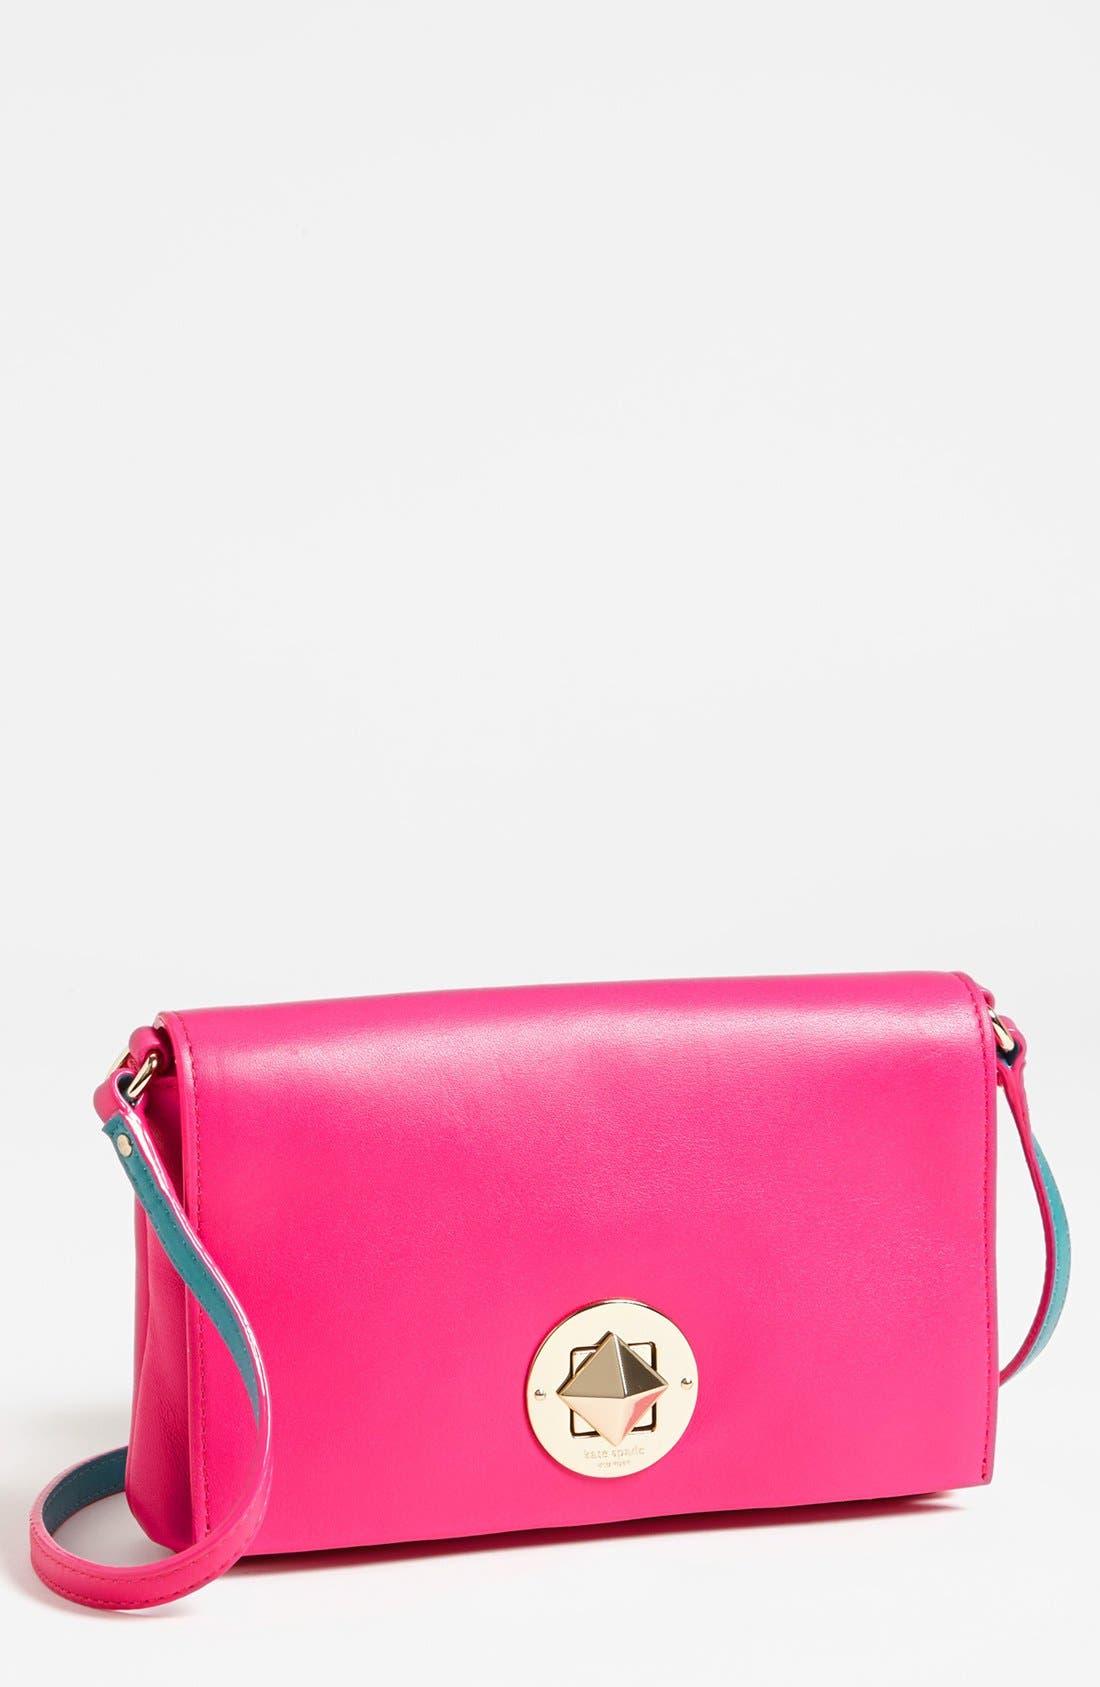 Main Image - kate spade new york 'brightspot avenue - sally' crossbody bag